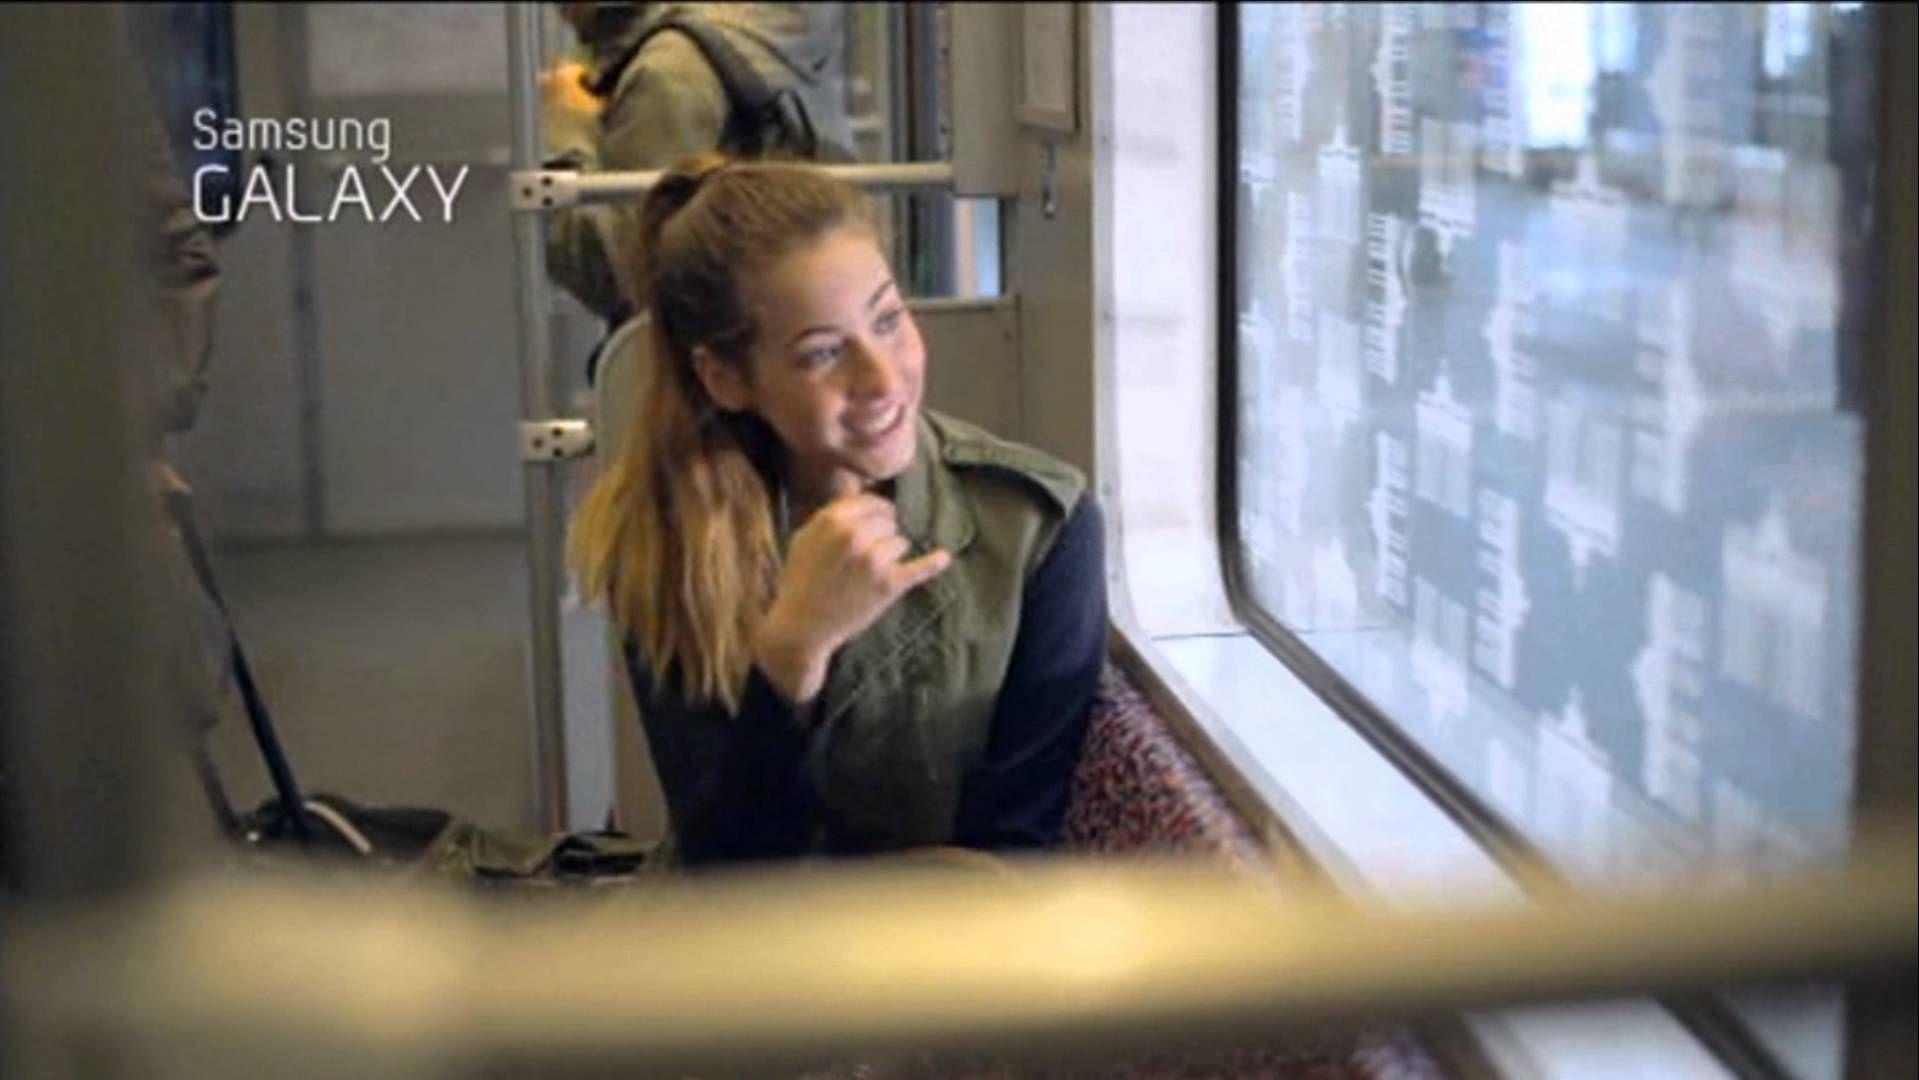 Samsung Galaxy Werbespot 2013 Samsung Galaxy Werbung 2013